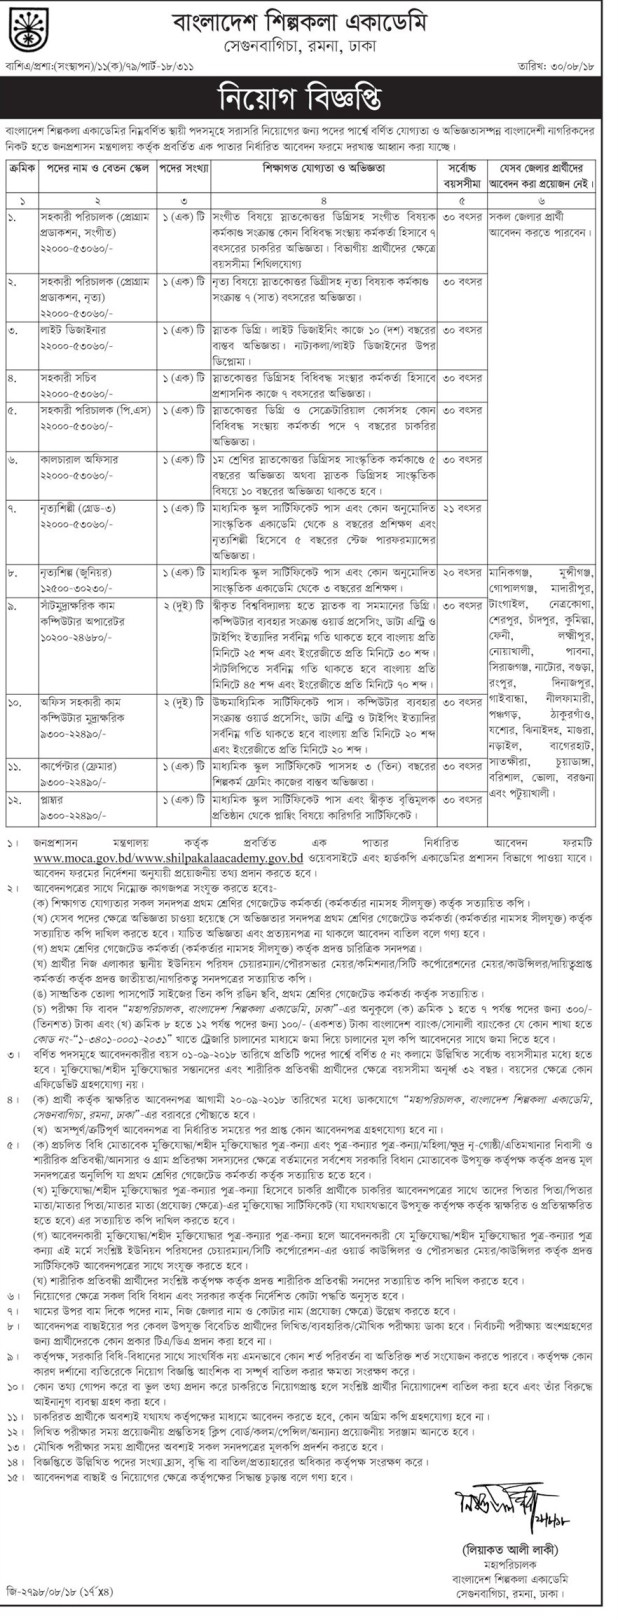 Bangladesh Shilpakala Academy Job Circular 2018 shilpakalaacademy.gov.bdBangladesh Shilpakala Academy Job Circular 2018 shilpakalaacademy.gov.bd